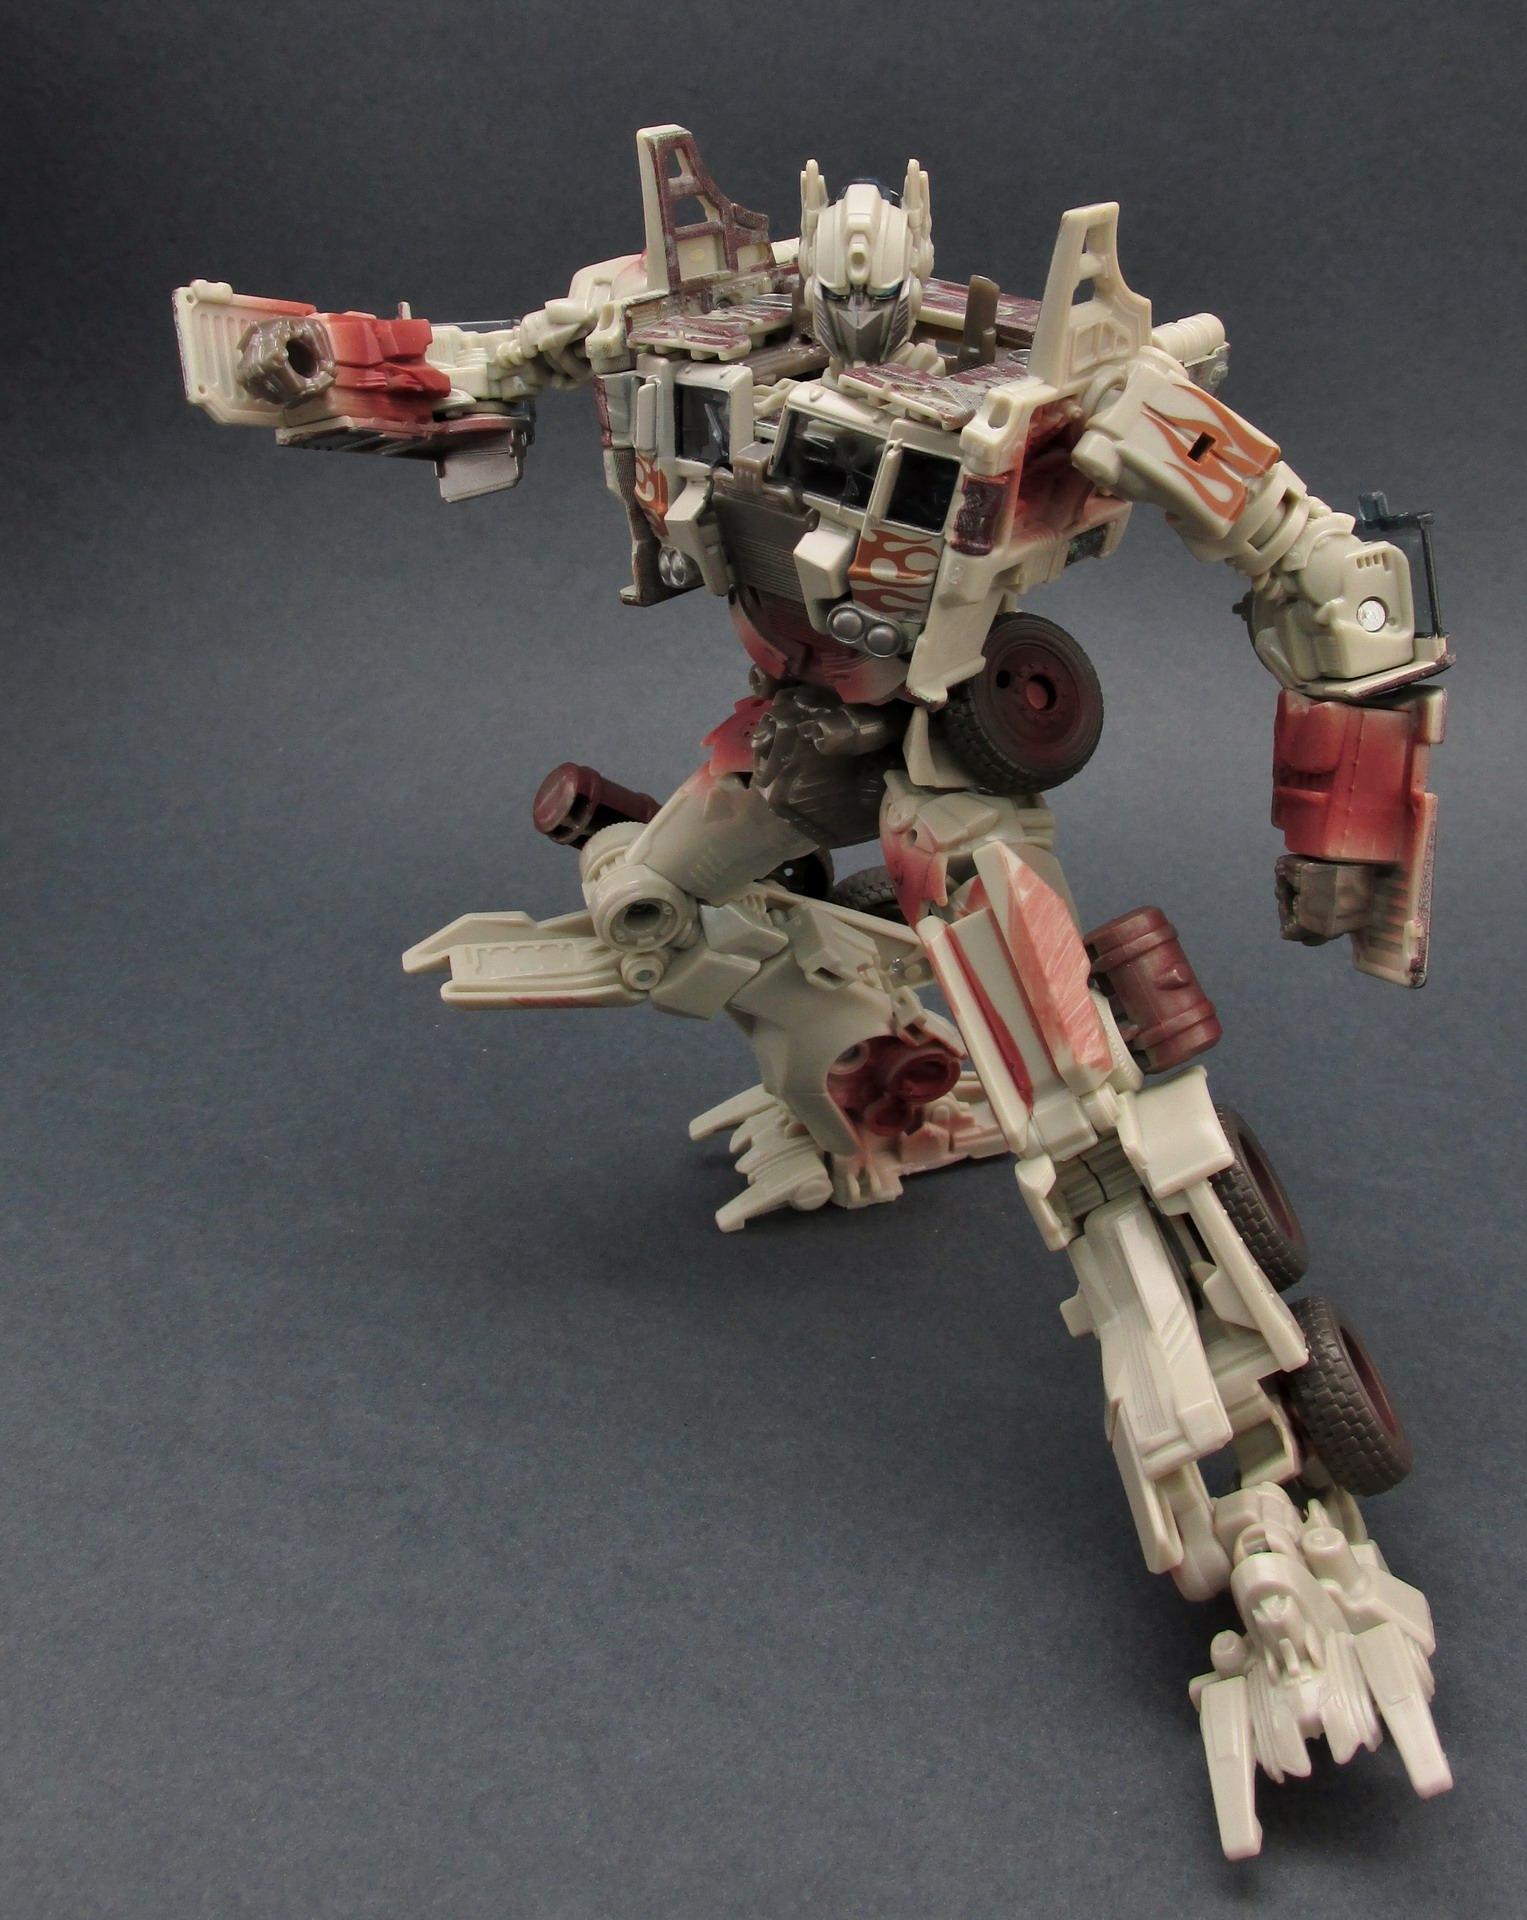 tfws age of extinction optimus prime rusty version toys